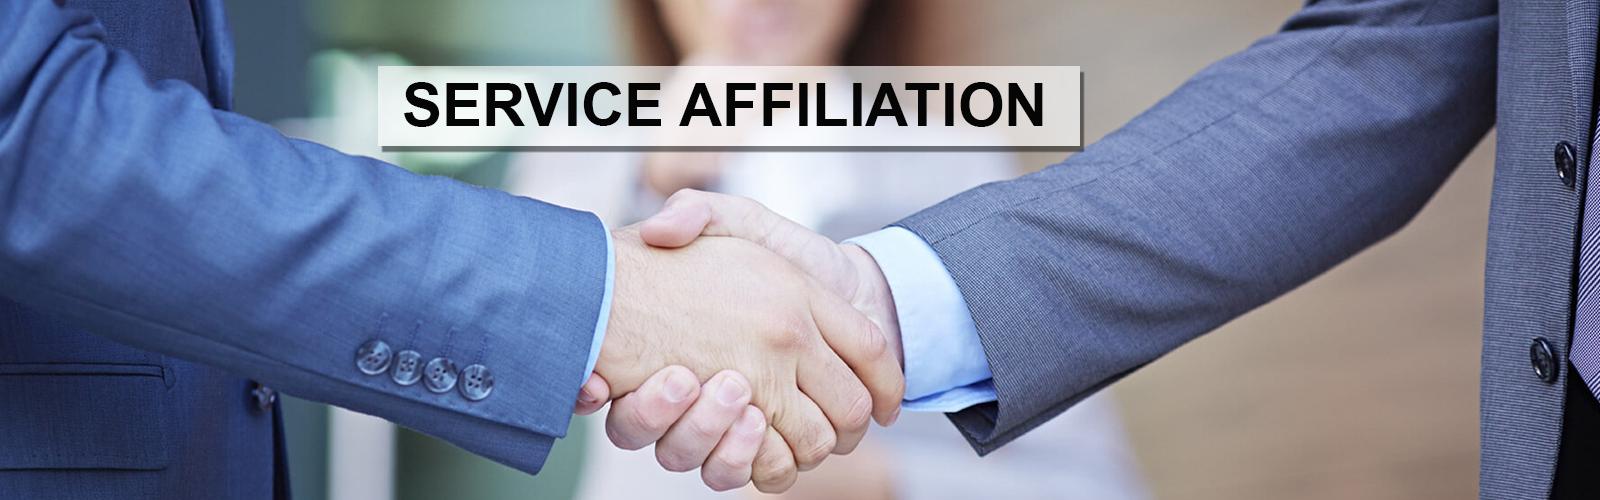 Service Affiliation